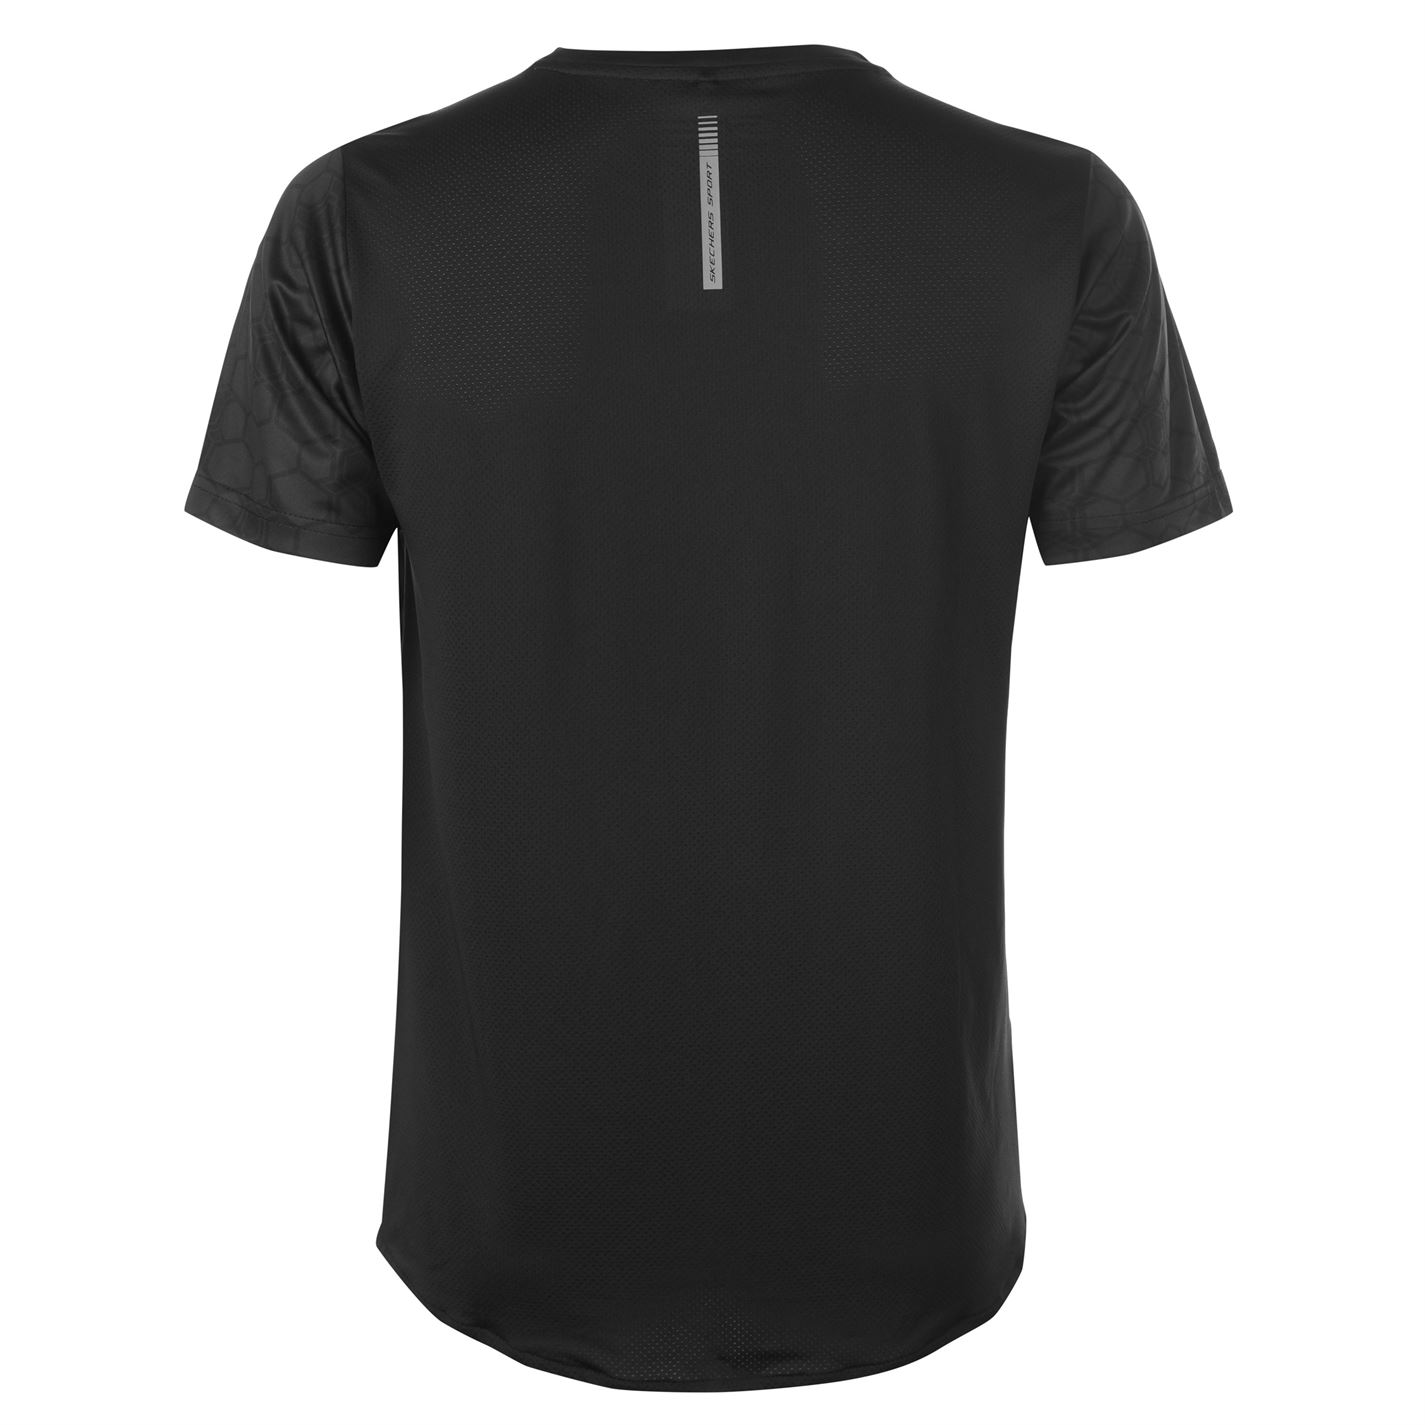 Skechers-Mens-Aop-Camiseta-Mangas-Cortas-Cuello-Redondo-Camiseta-Top-Performance miniatura 8